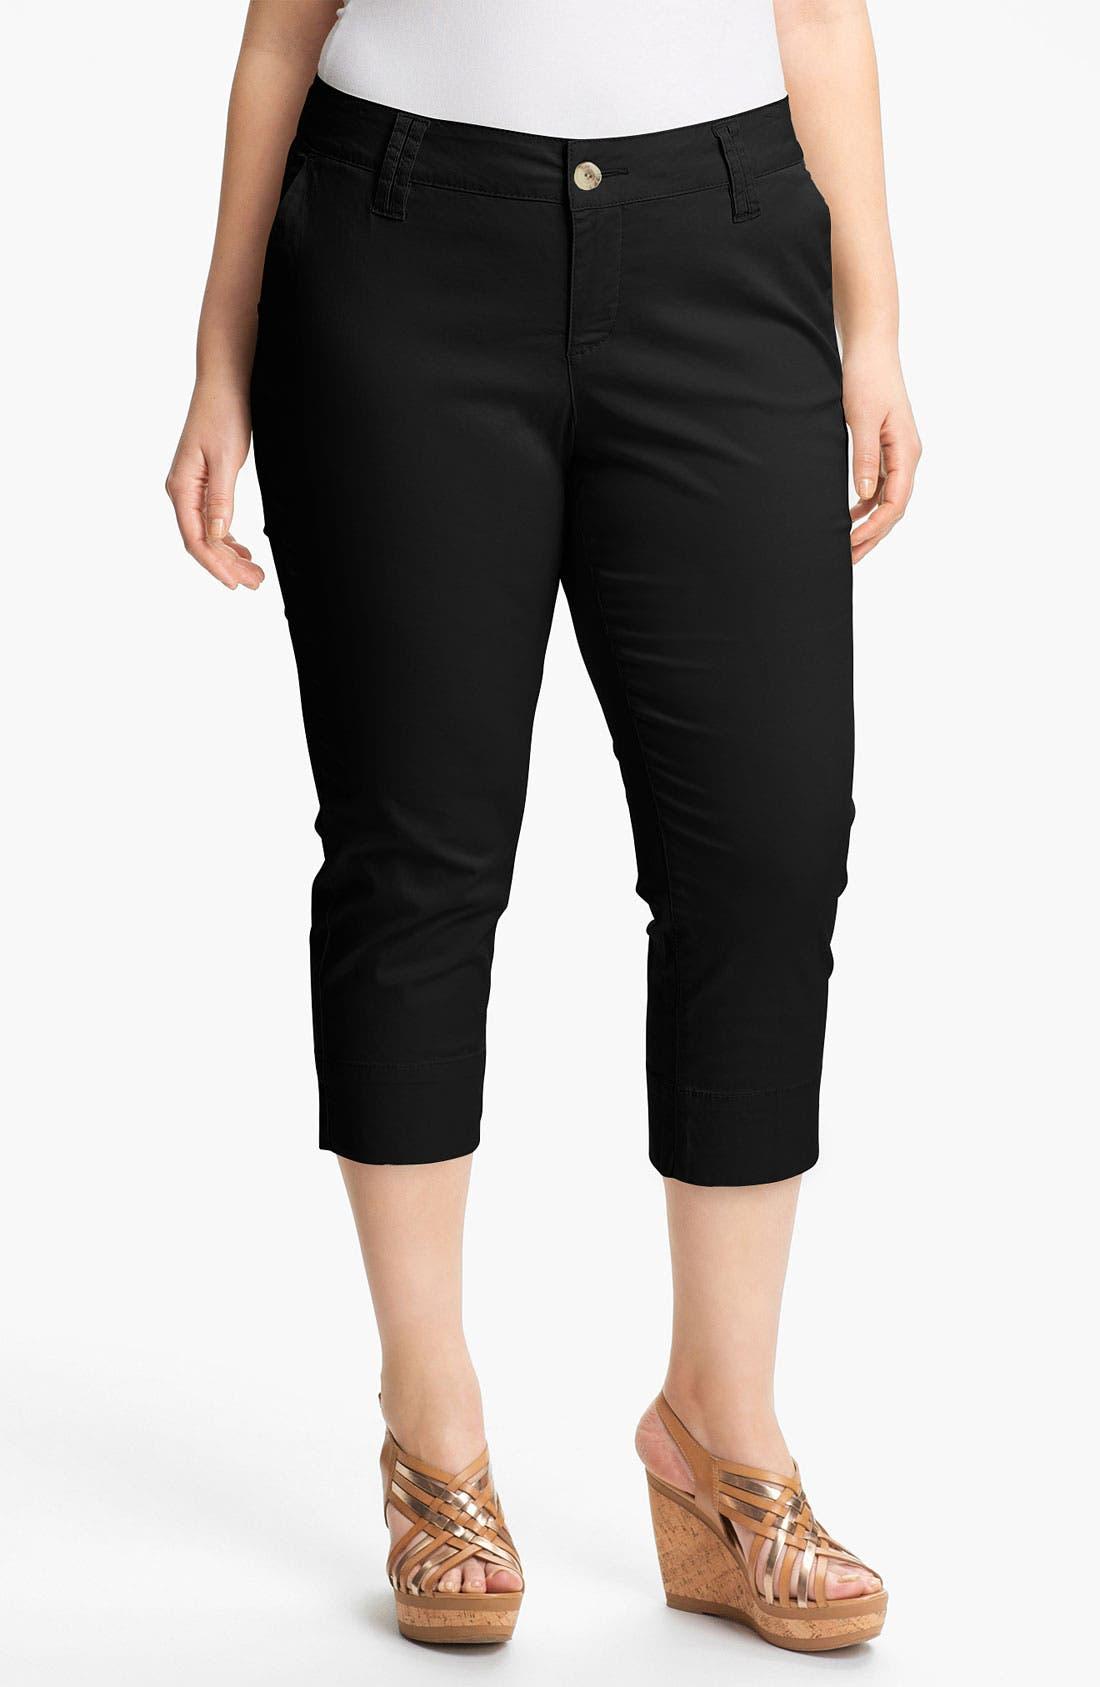 Main Image - Jag Jeans 'Maitland' Crop Jeans (Plus Size) (Online Only)